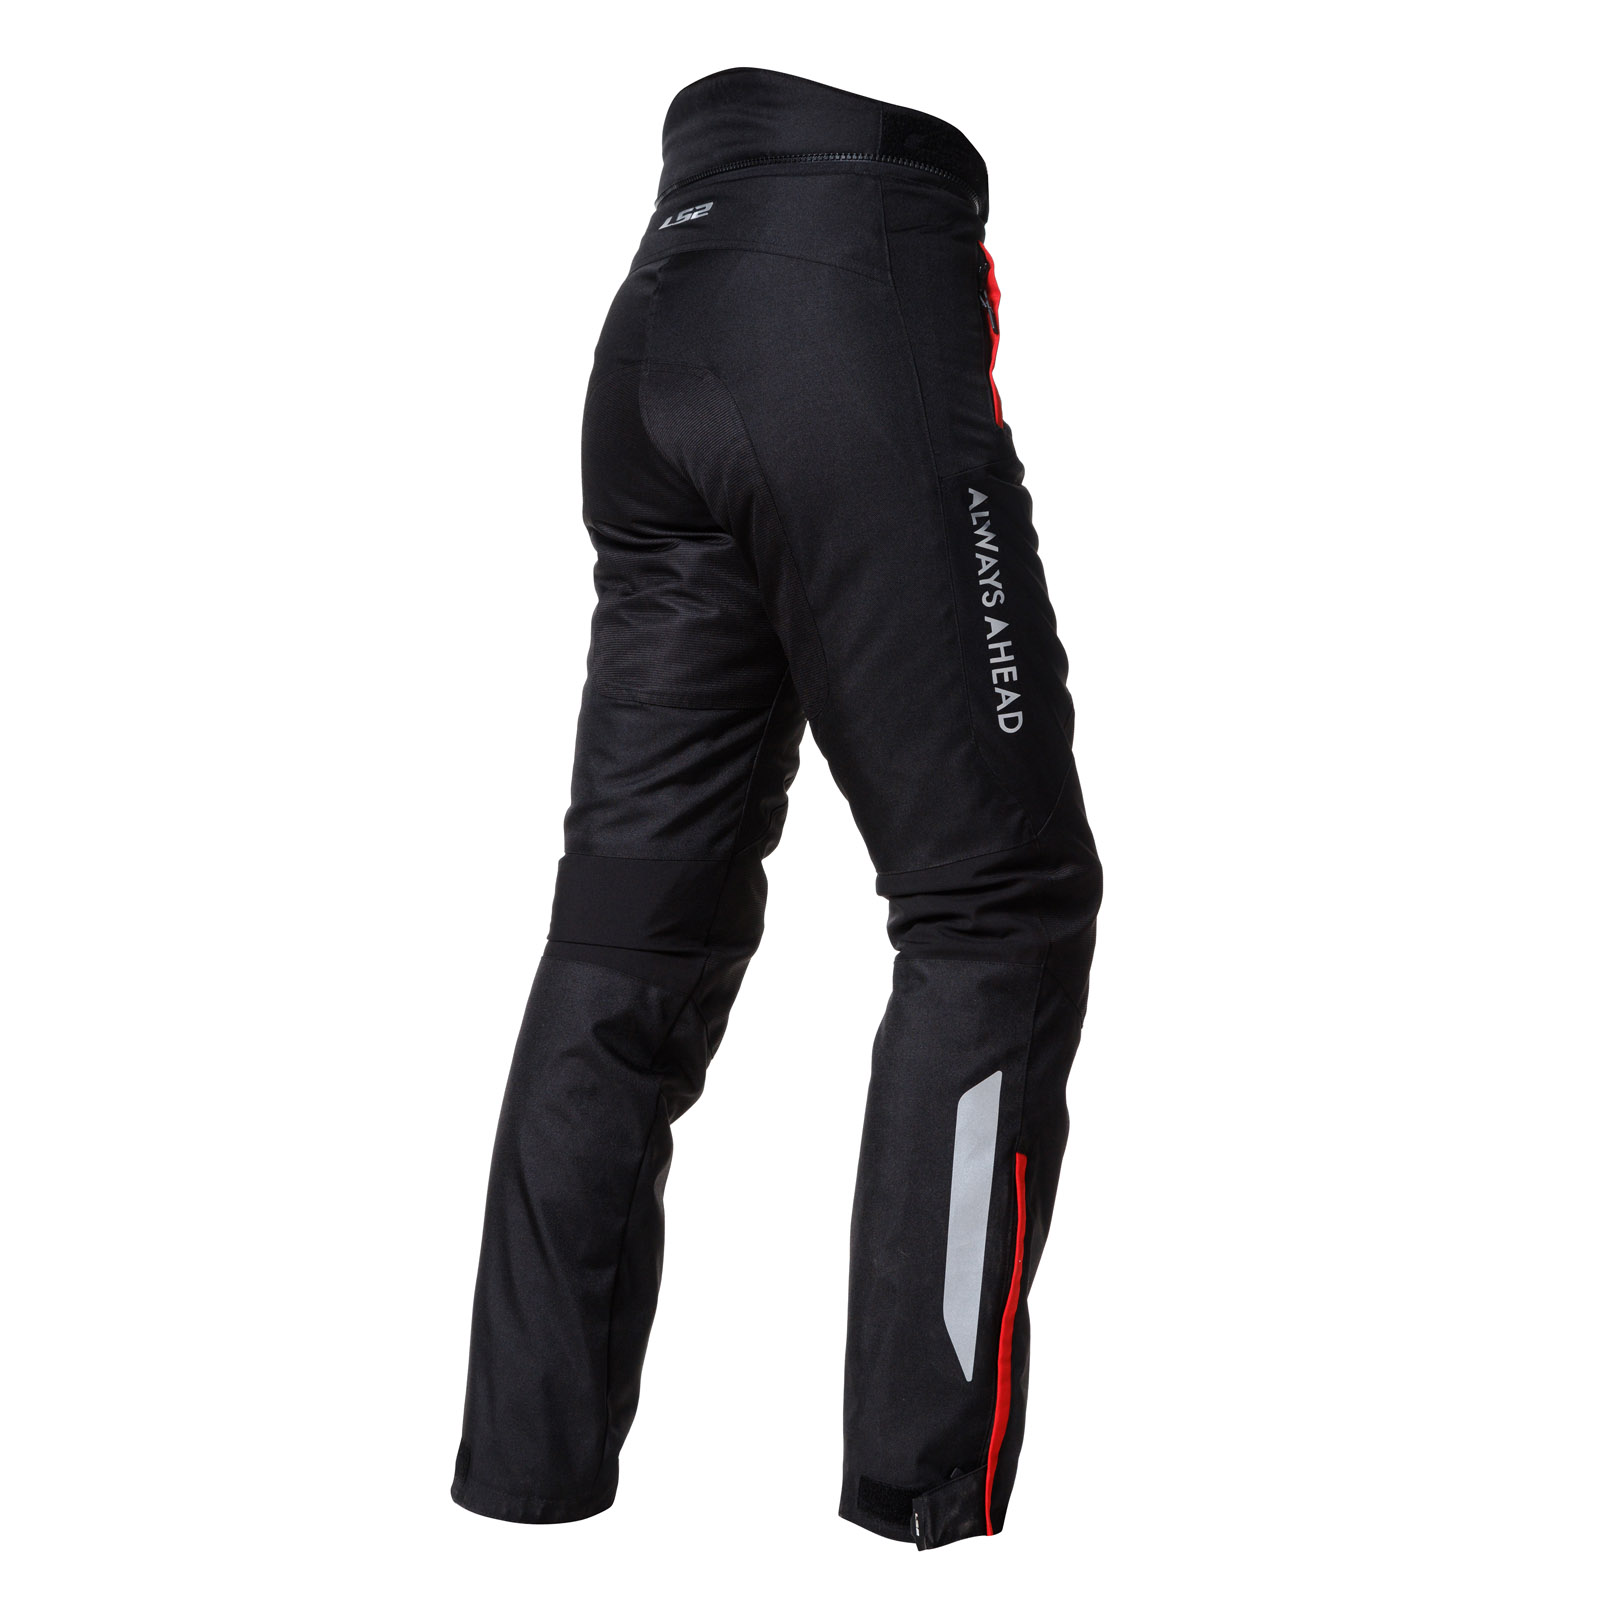 pantalon ls2 chart negro mujer talle l